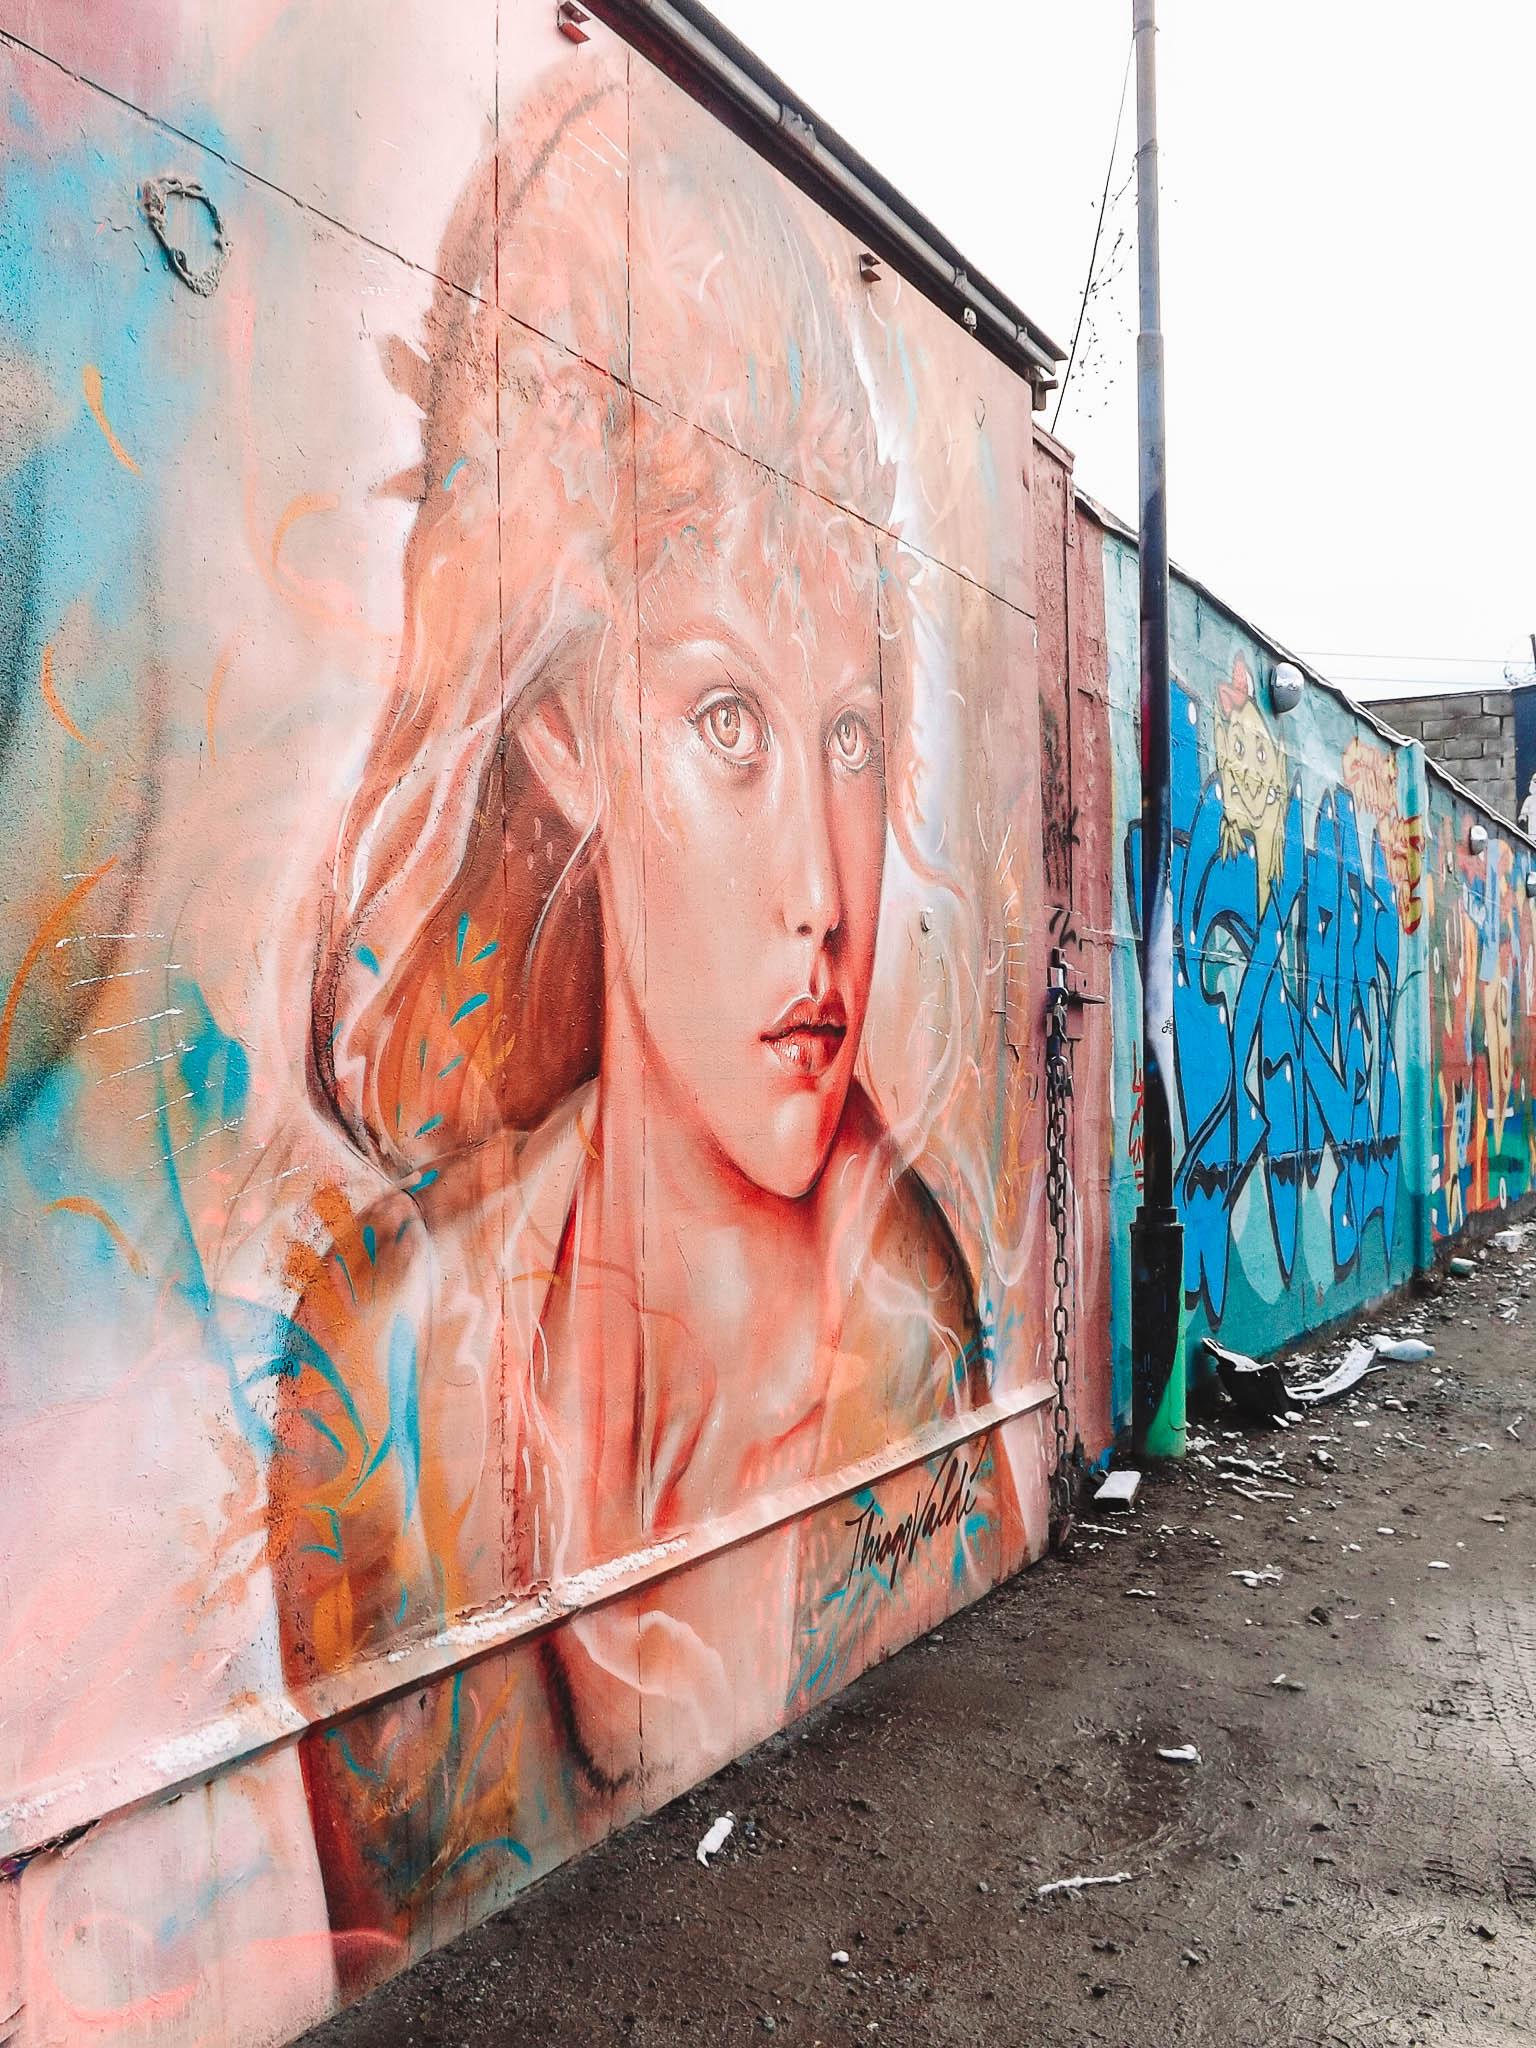 mural Snosatra graffiti park Stockholm Sweden | Best Street Art Cities